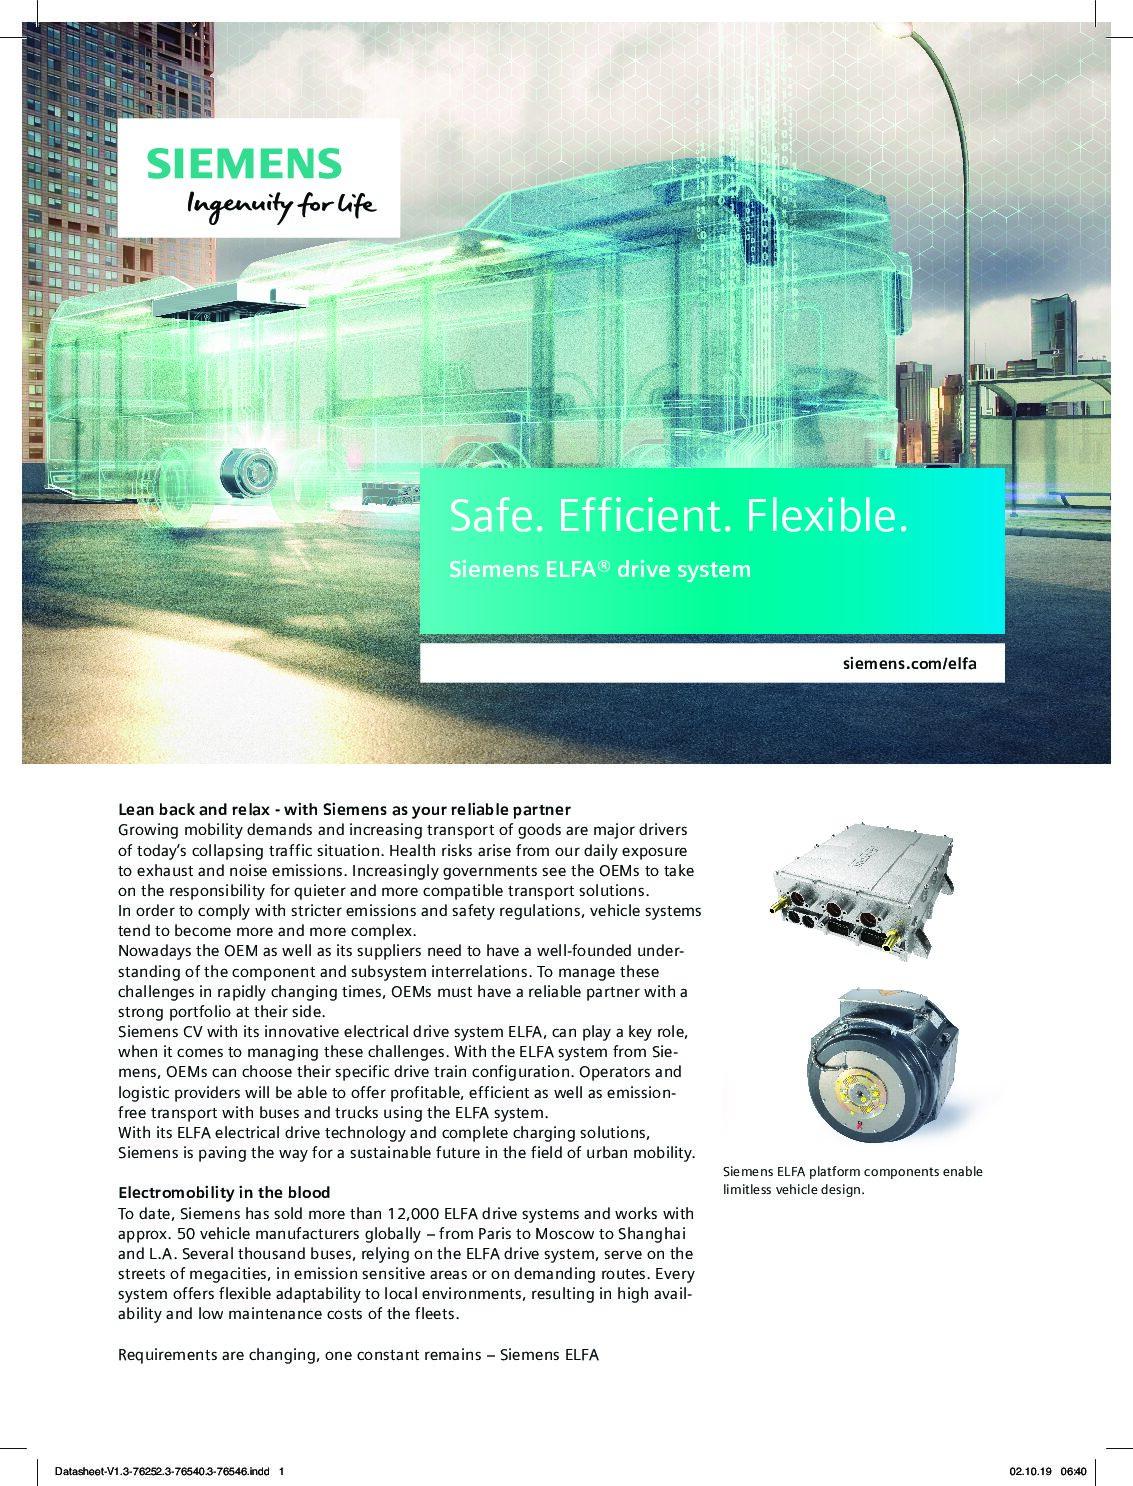 Siemens ELFA Drive System